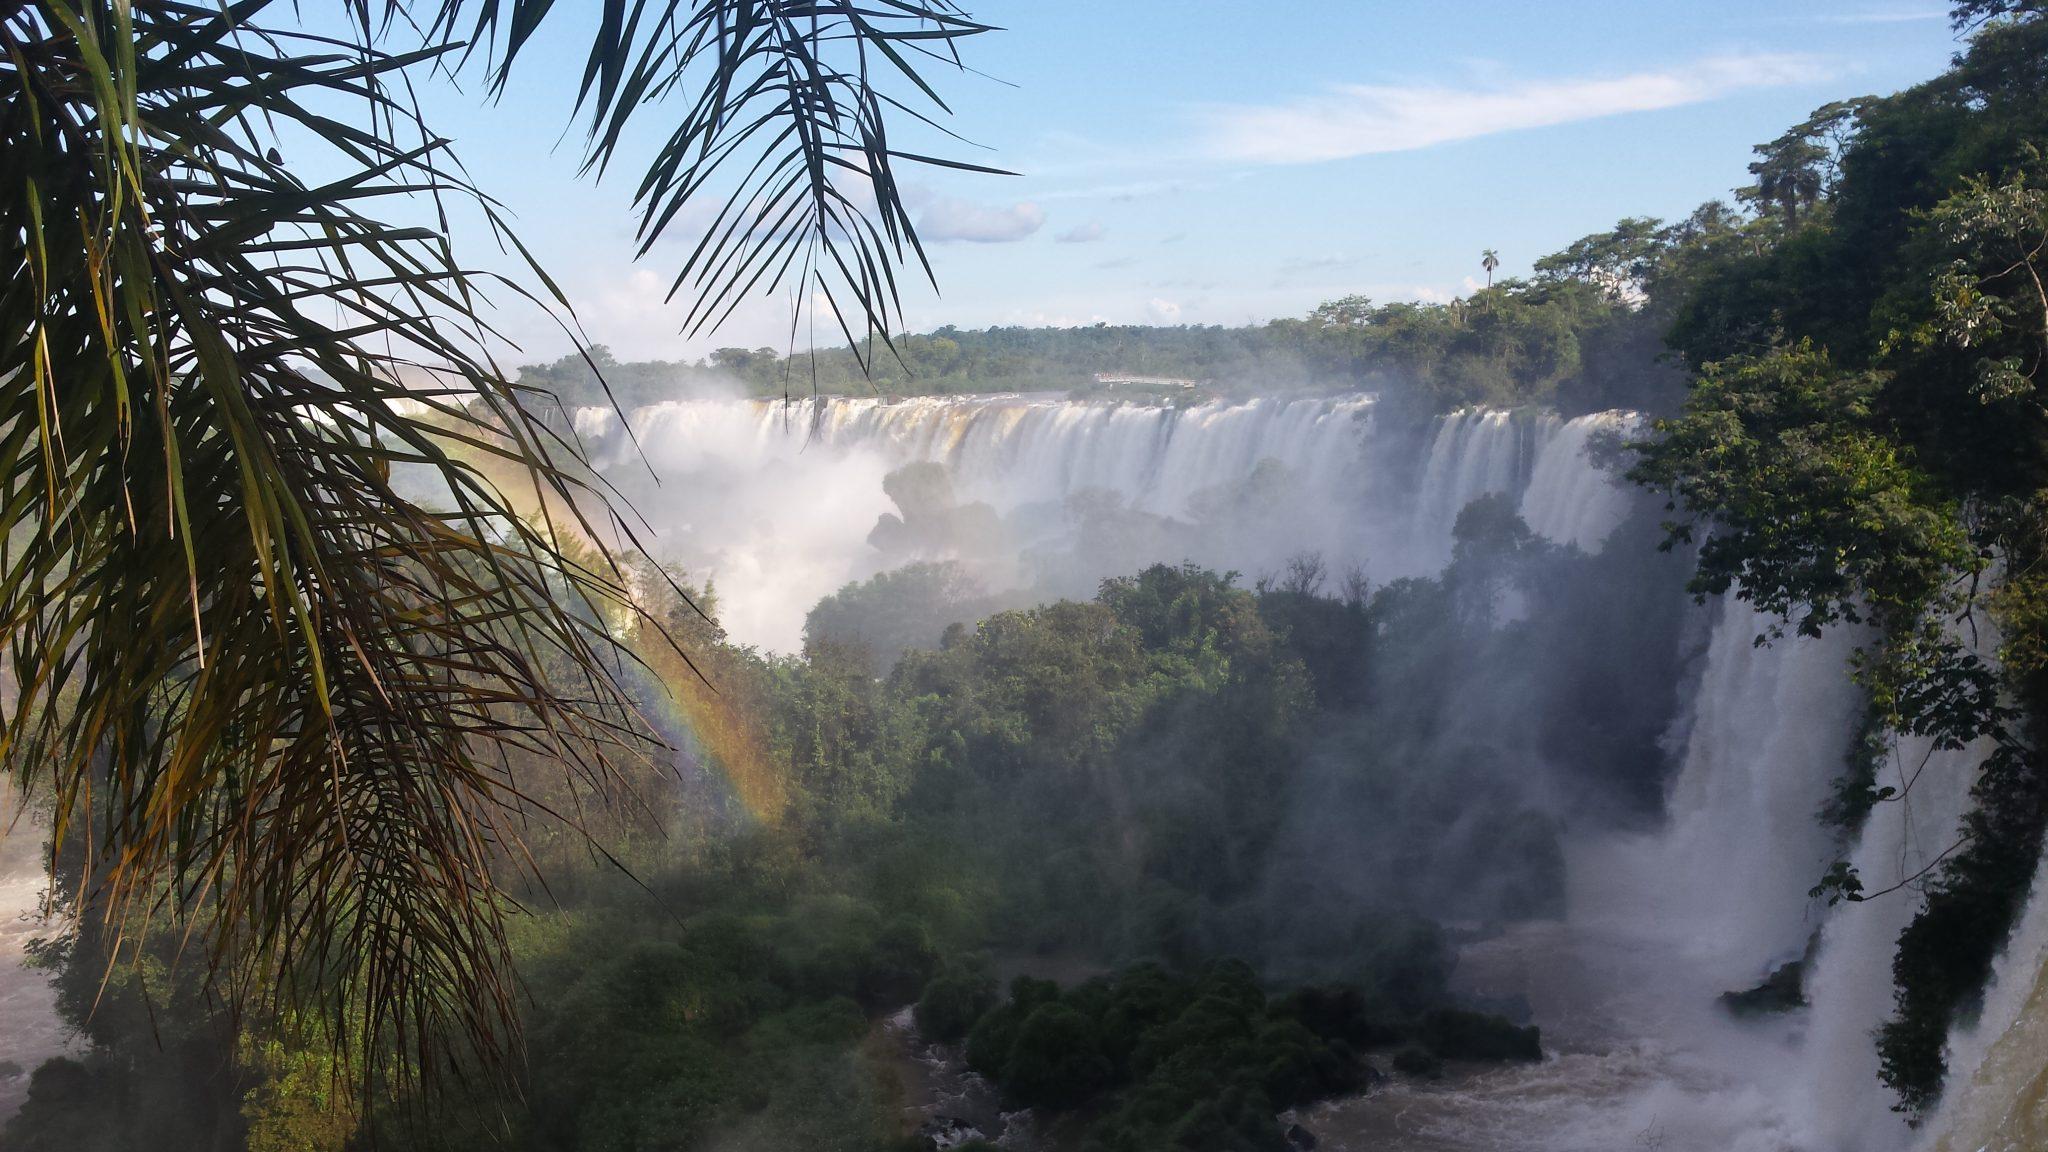 Img post Cataratas paso superior lado argentino Iguazú. Pasaporte y Millas